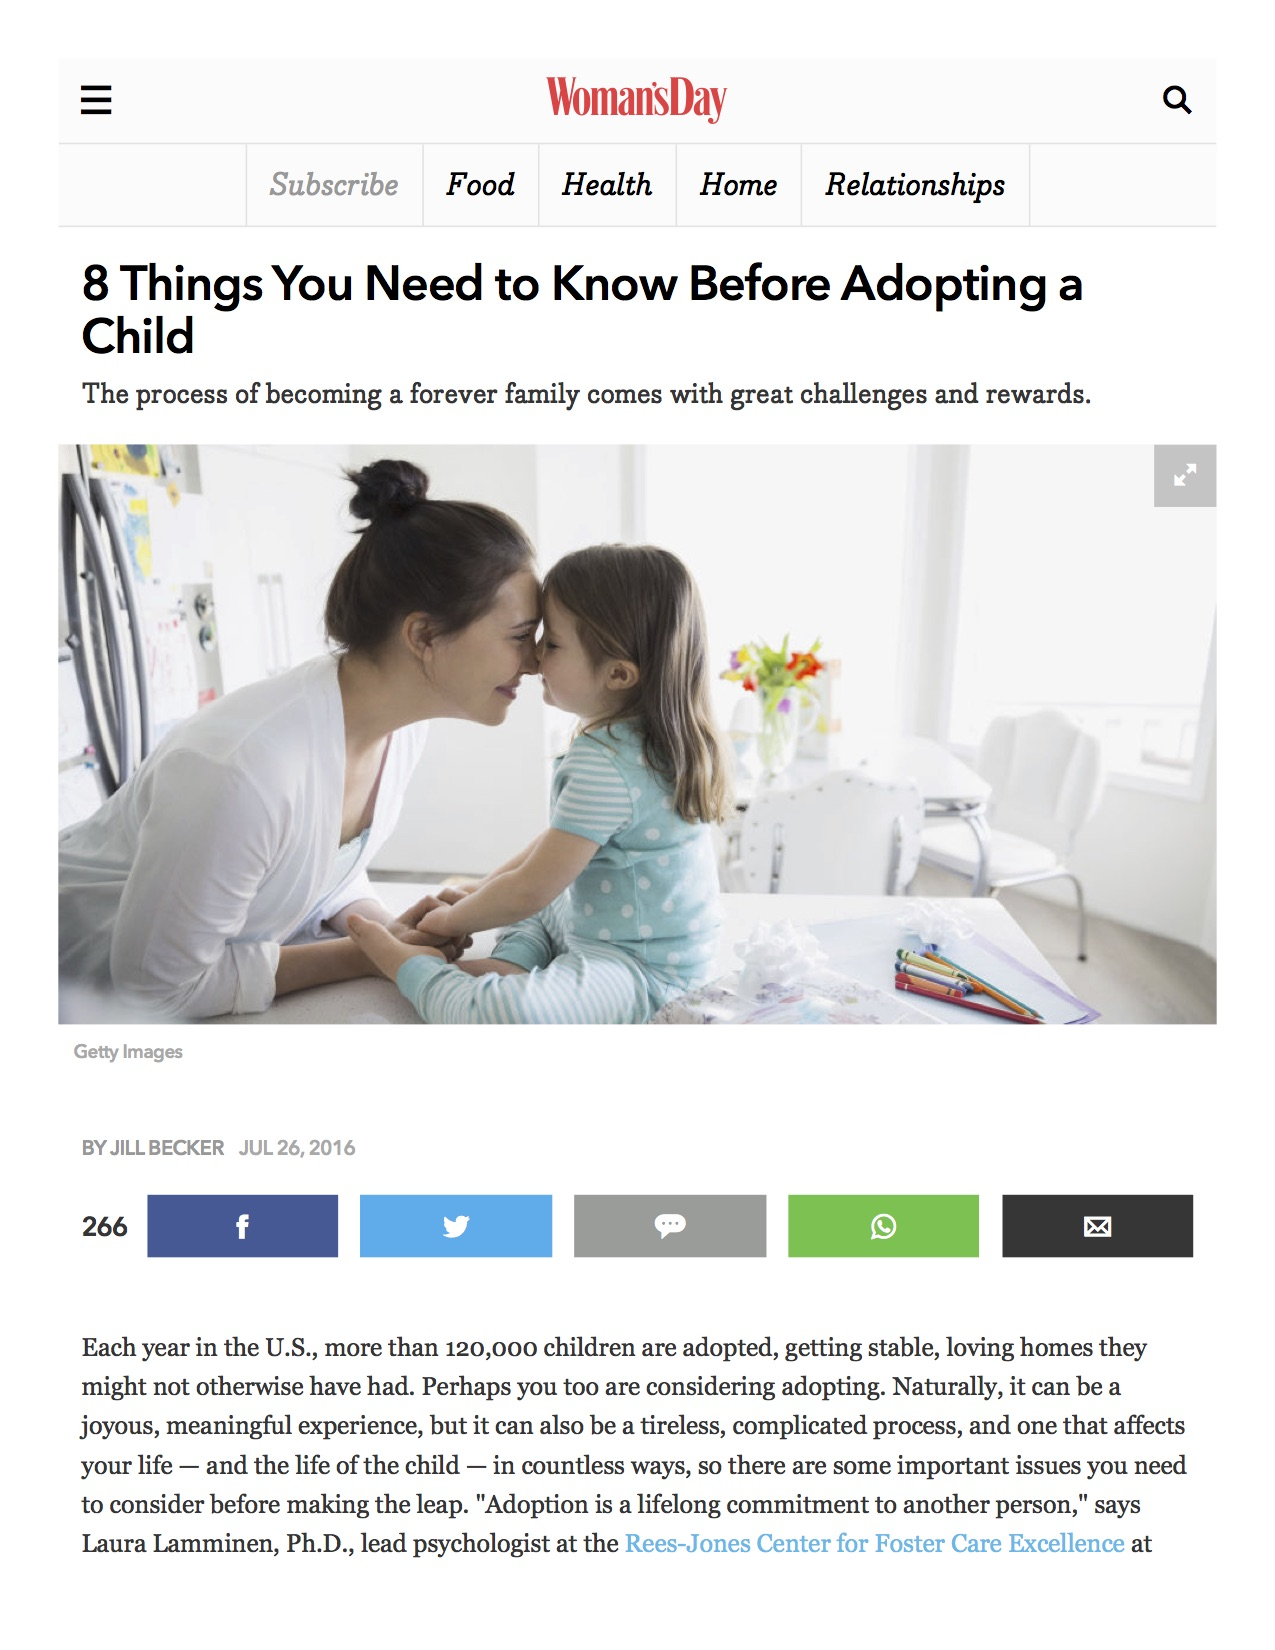 WomansDay Adoption